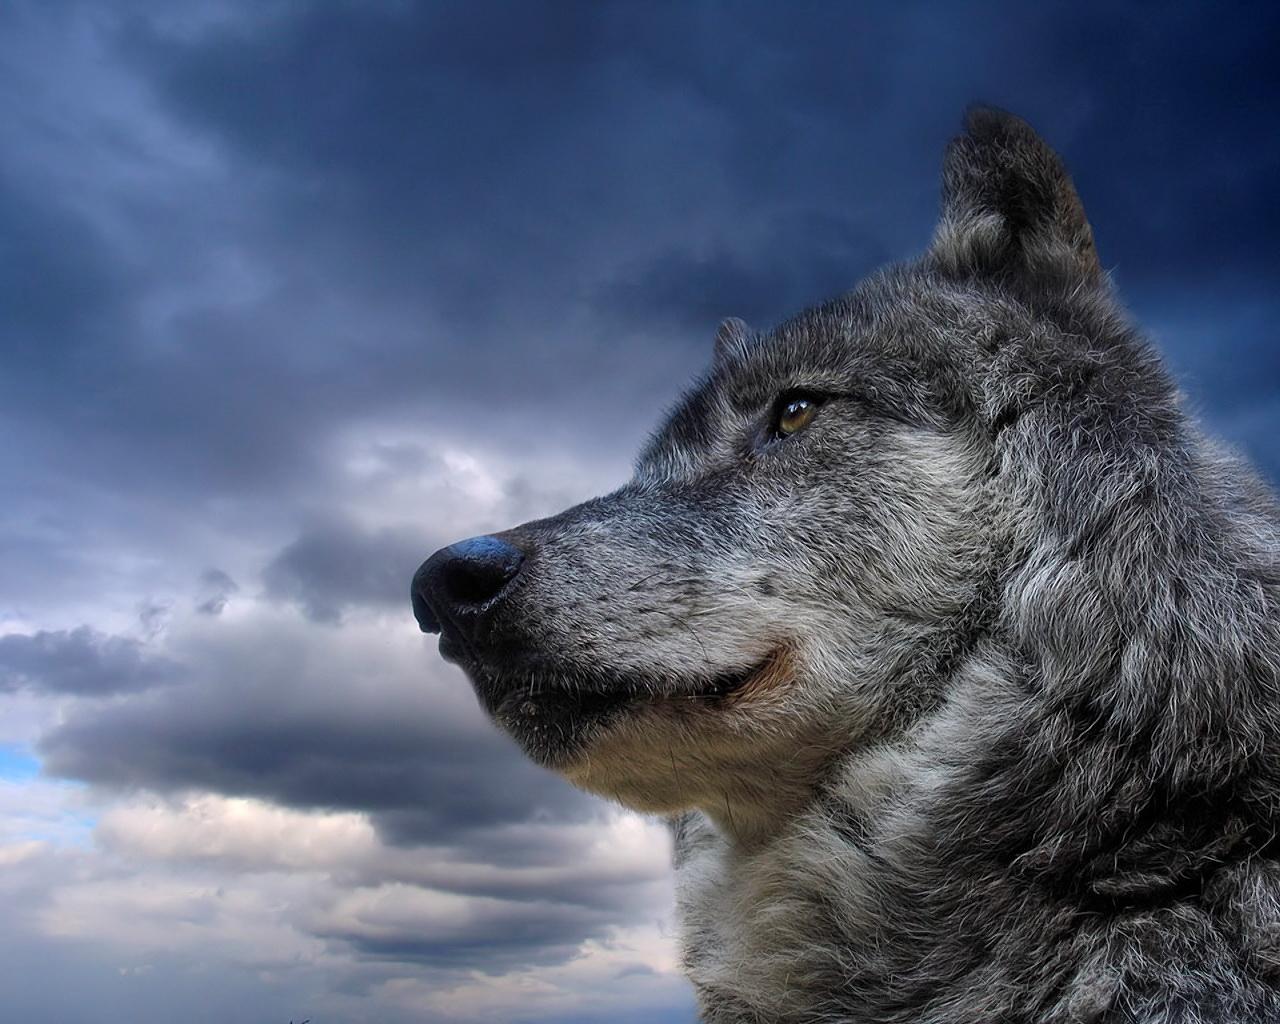 Portrait of a Wolf in Front of a Cloudy Sky desktop wallpaper 1280x1024